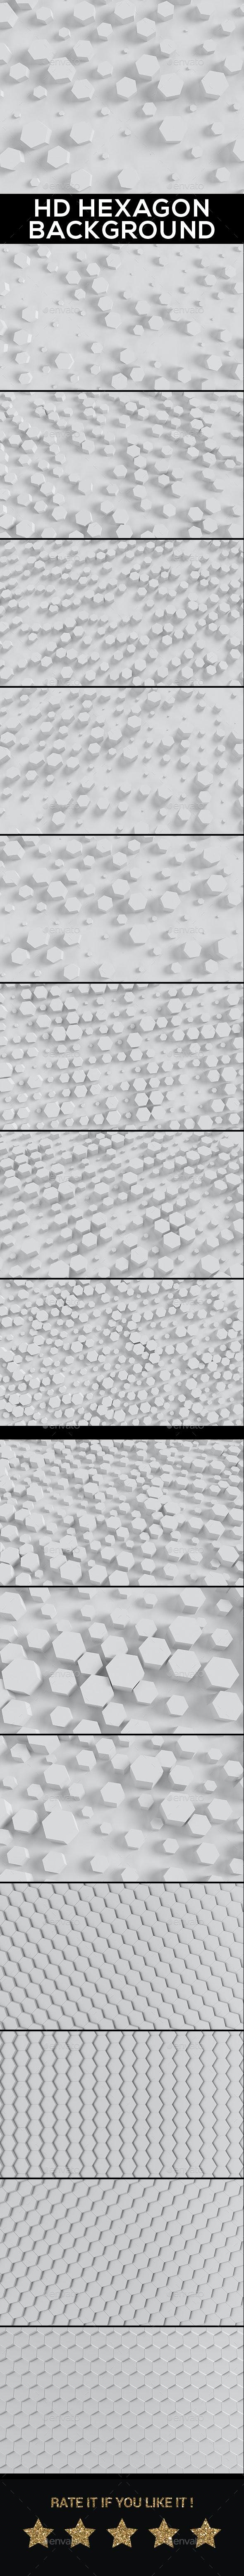 HD Hexagon 27x Backgrounds - Backgrounds Graphics